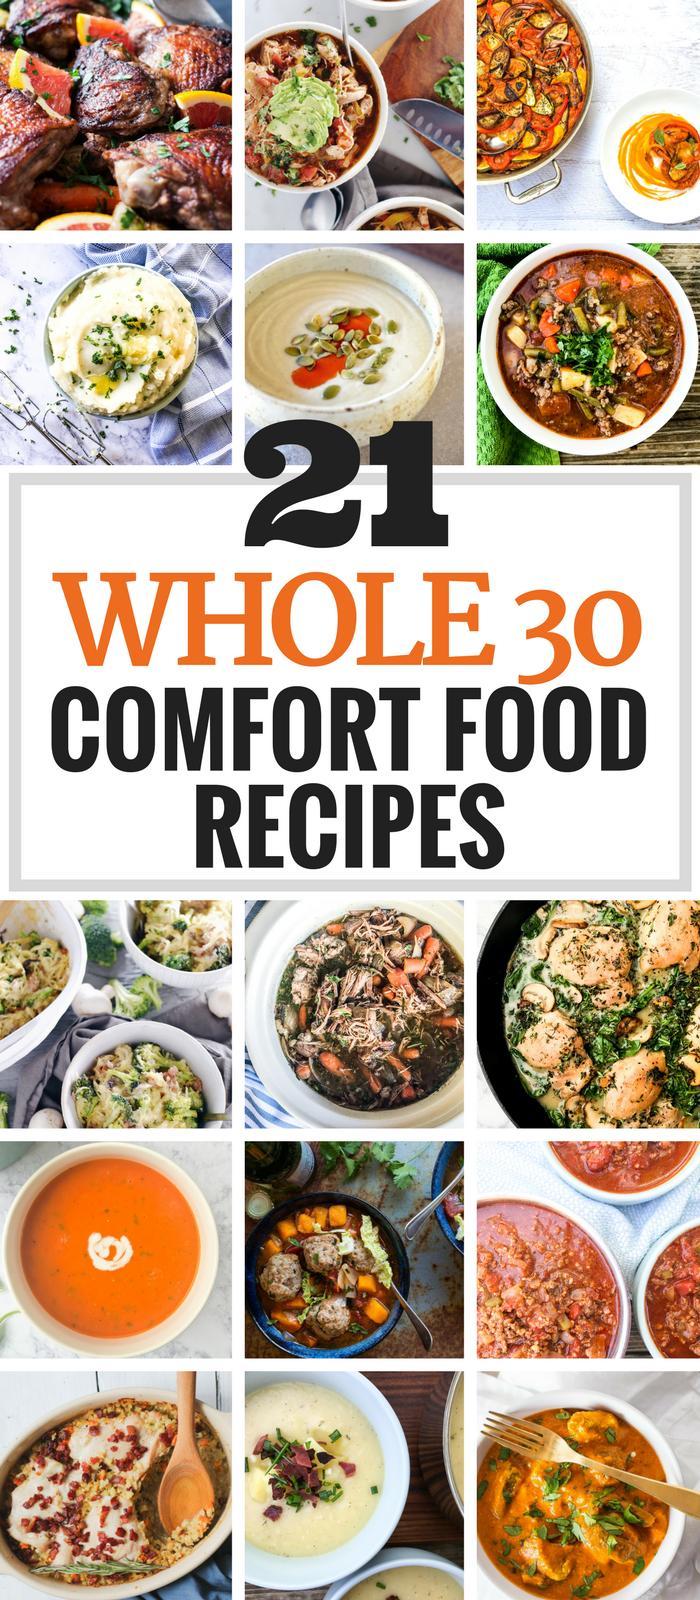 21 Whole30 Comfort Food Recipes via The Whole Cook